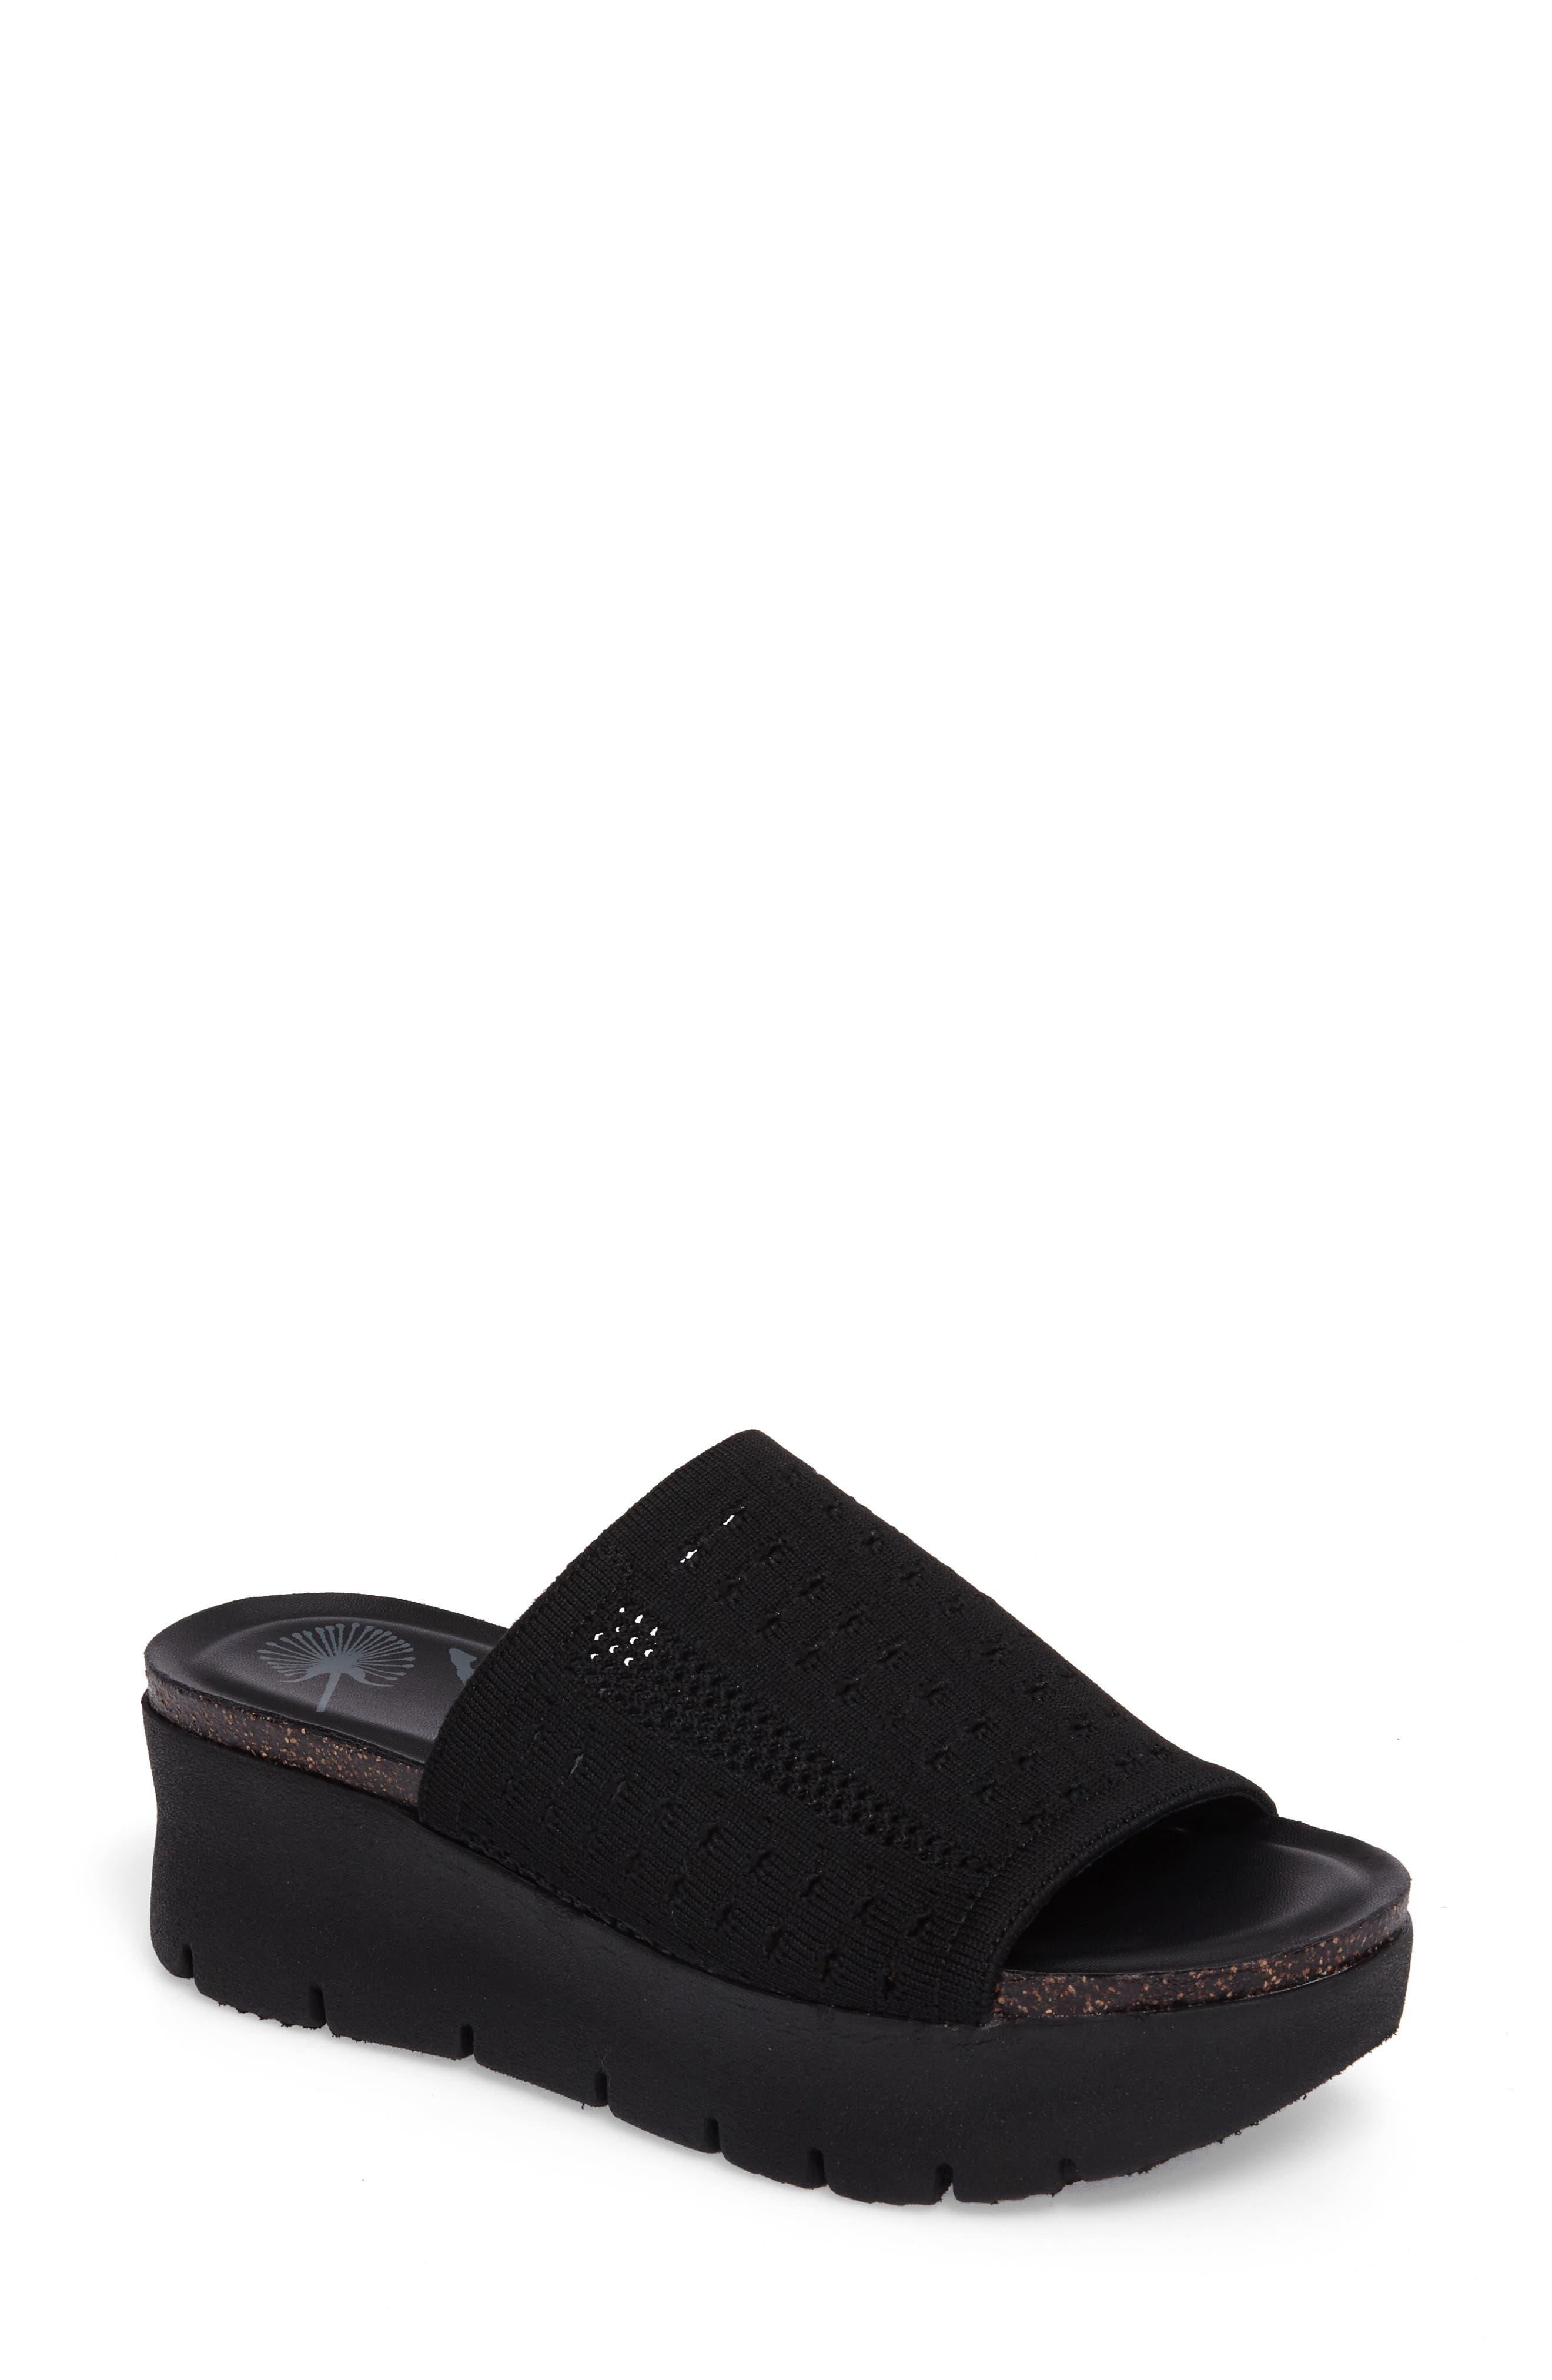 OTBT Gravity Slide Sandal, Main, color, BLACK FABRIC